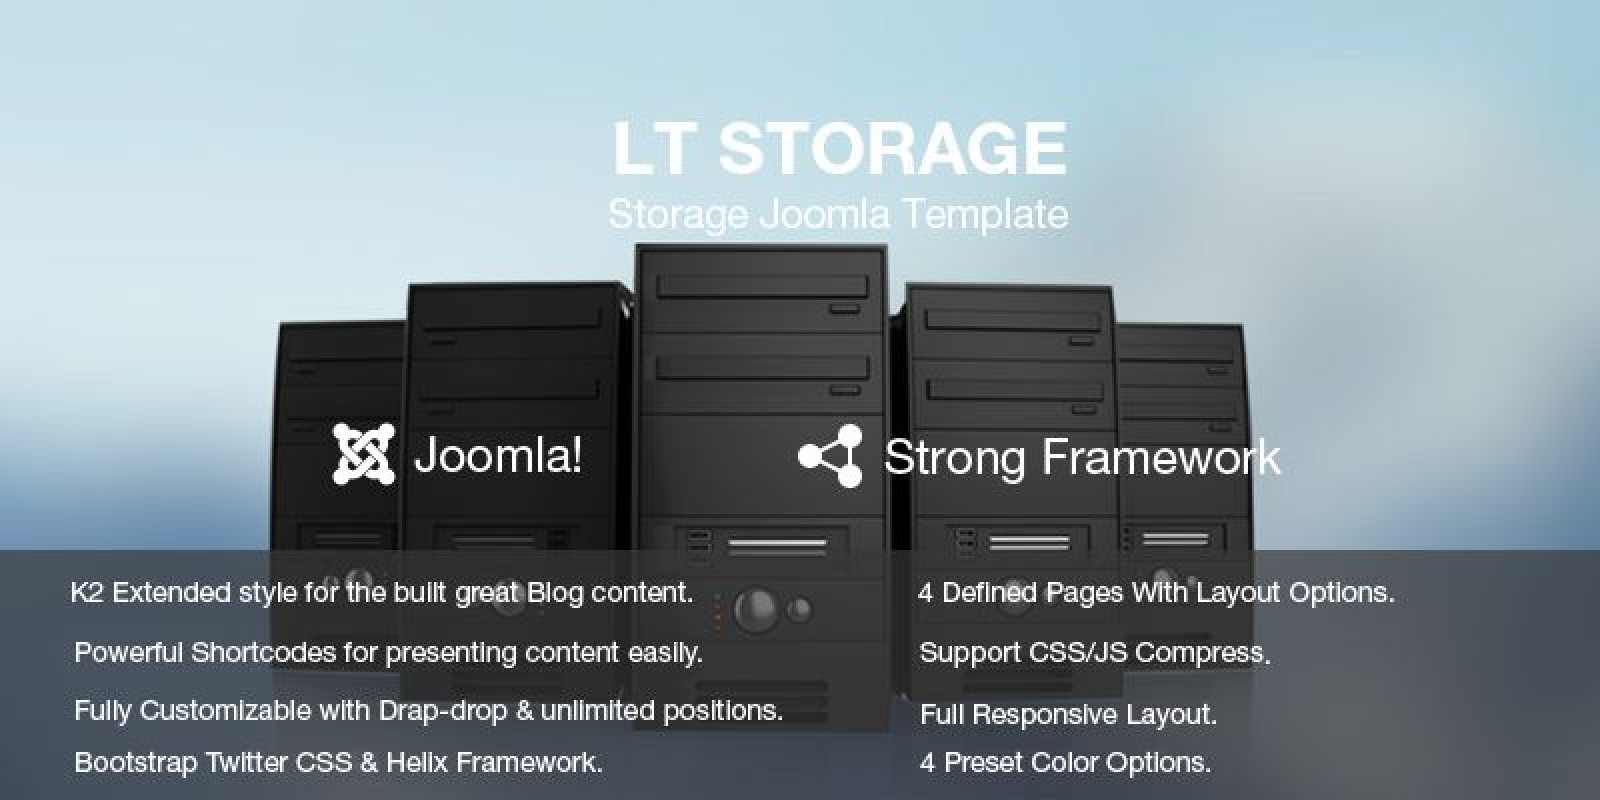 LT Storage – Server Hosting Joomla Template